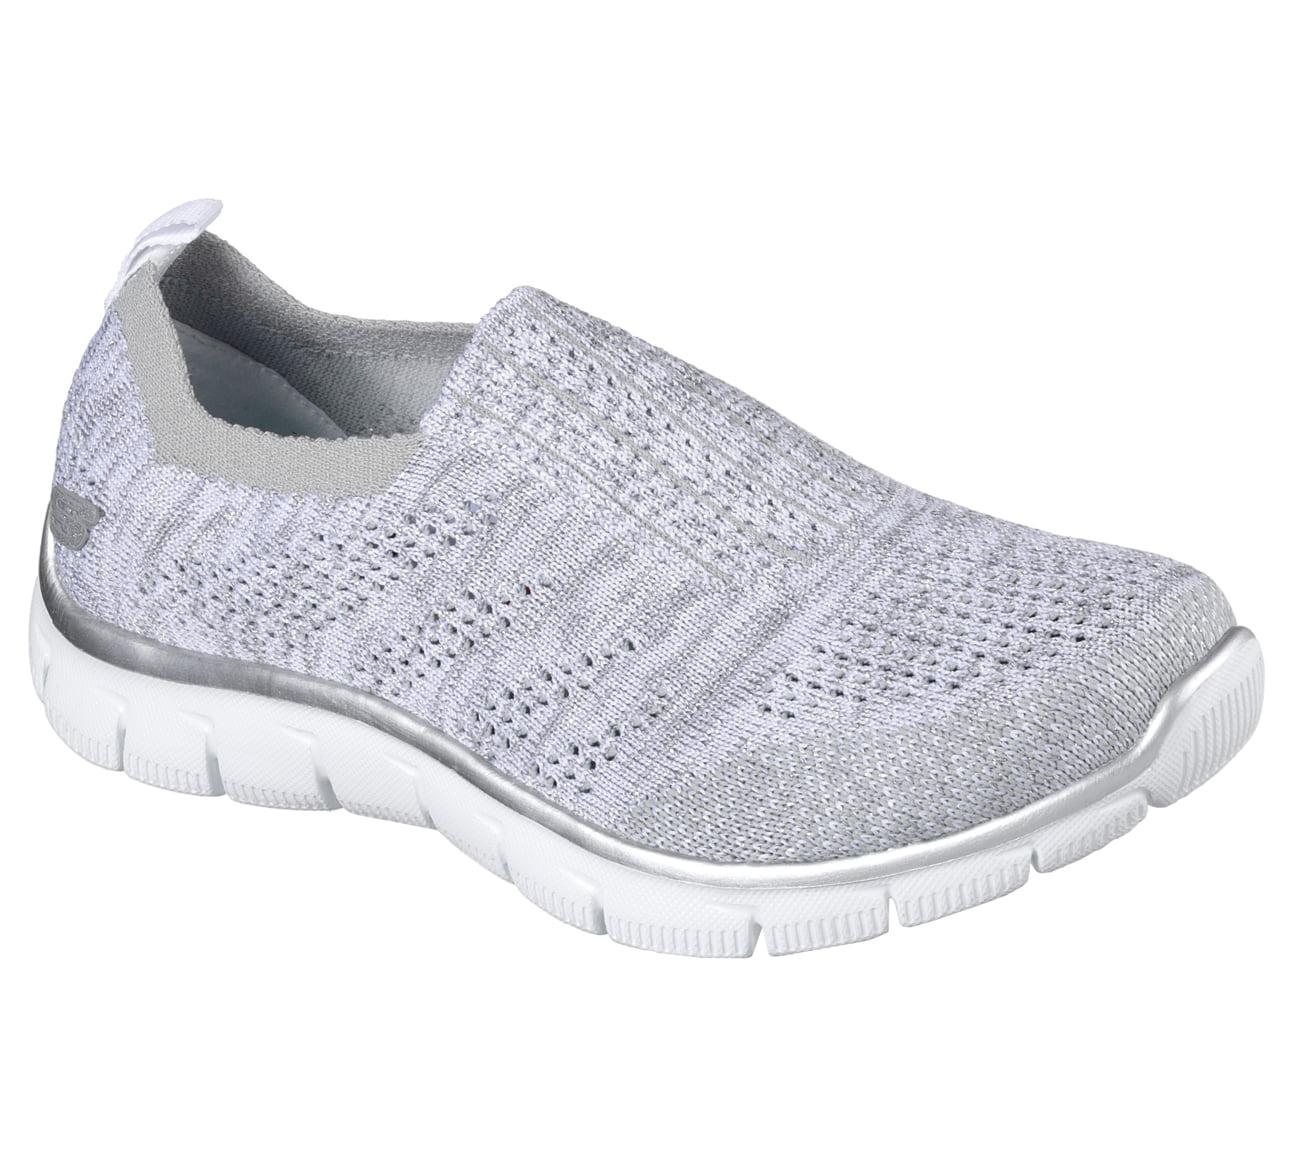 skechers - 12420GYSL Women's EMPIRE - skechers ROUND UP Walking Shoes a6421b